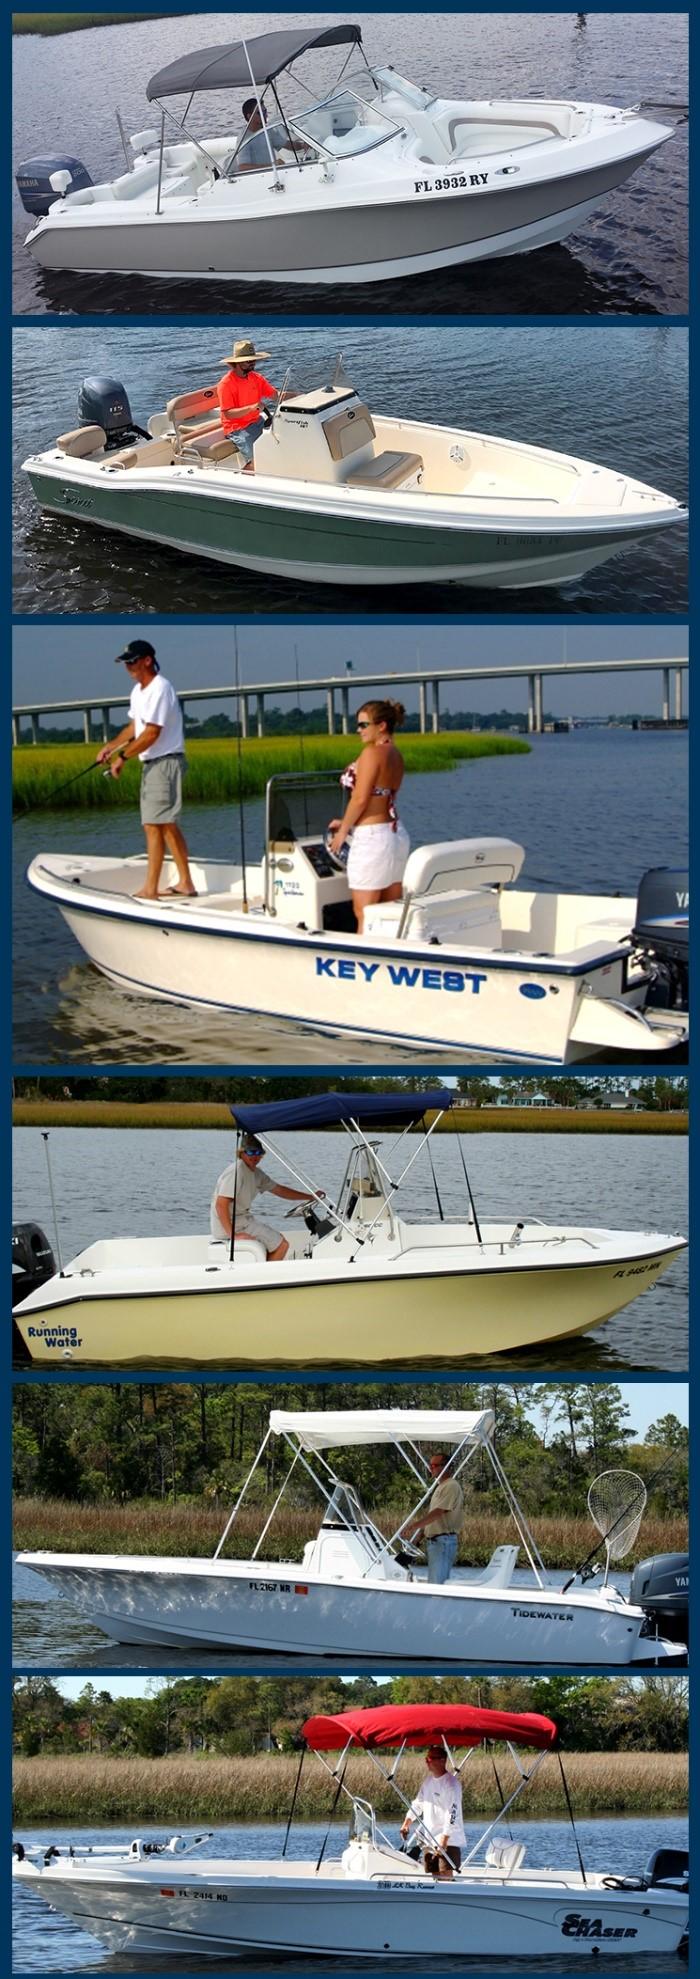 A few of the boats in the Jax Boat Club Fishing Fleet